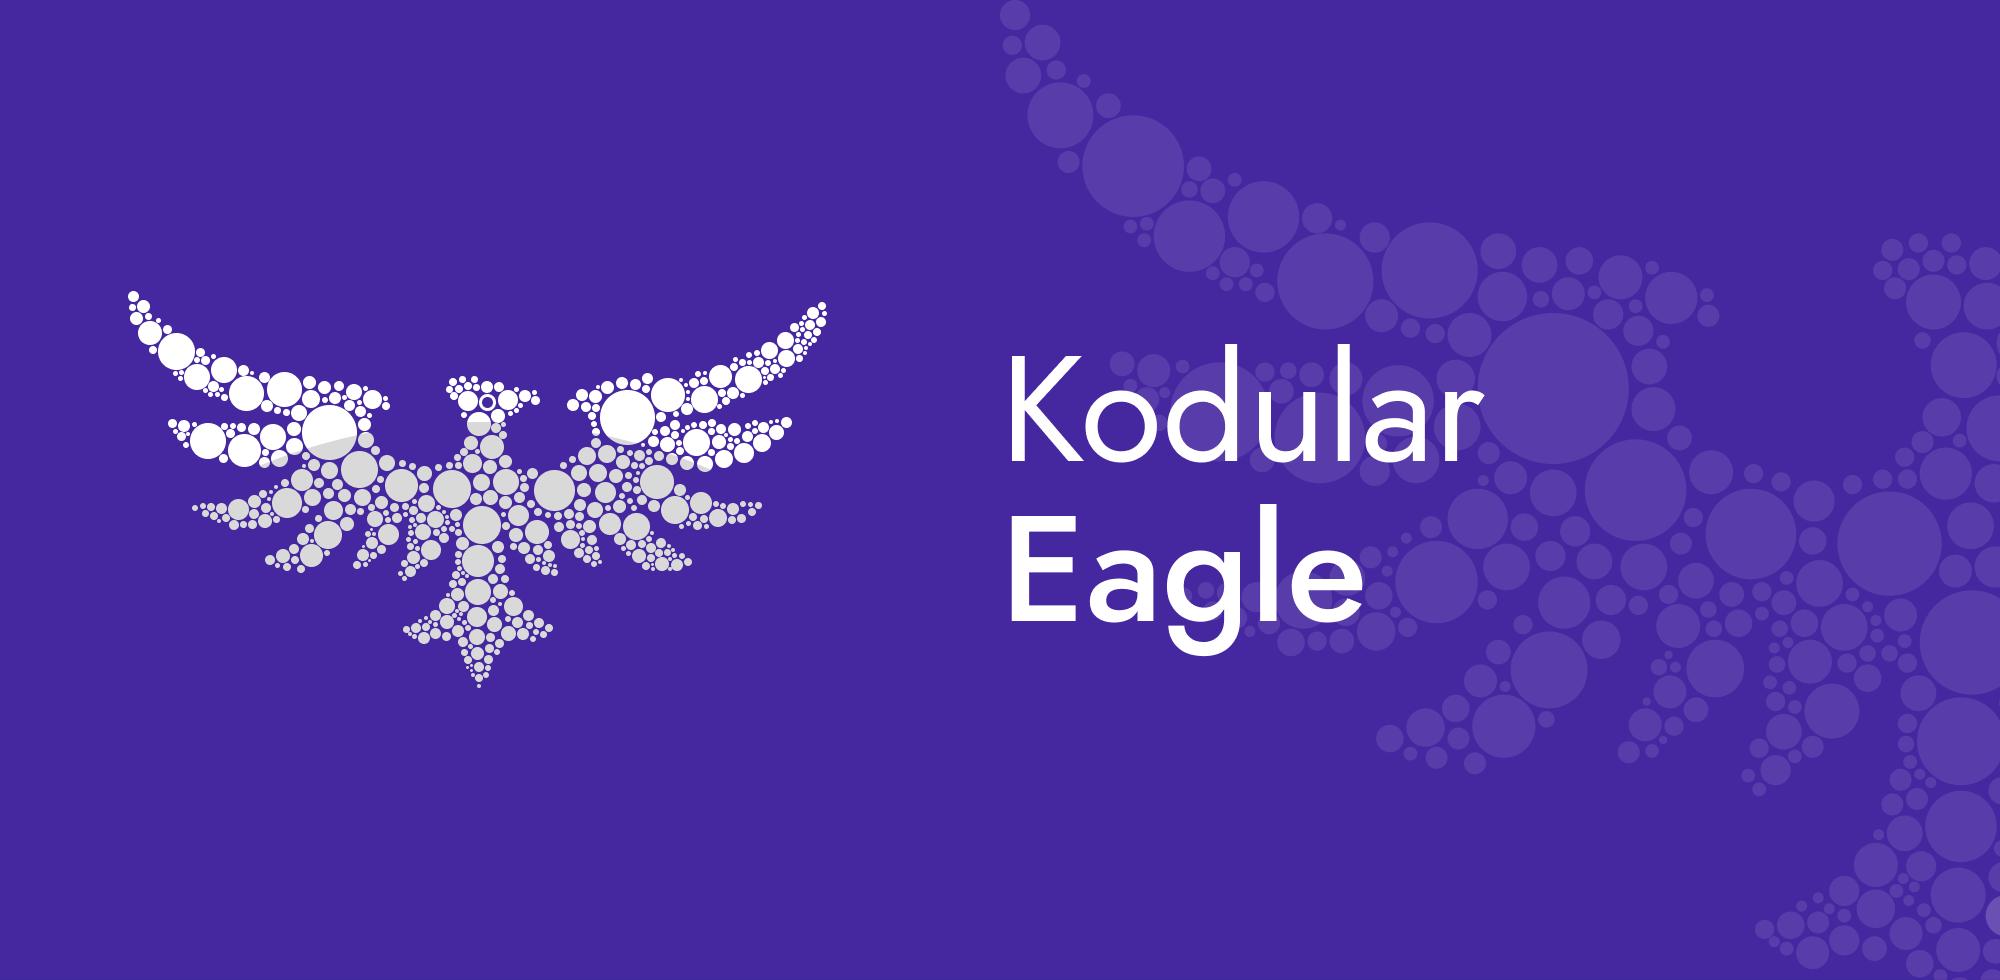 Home | Kodular